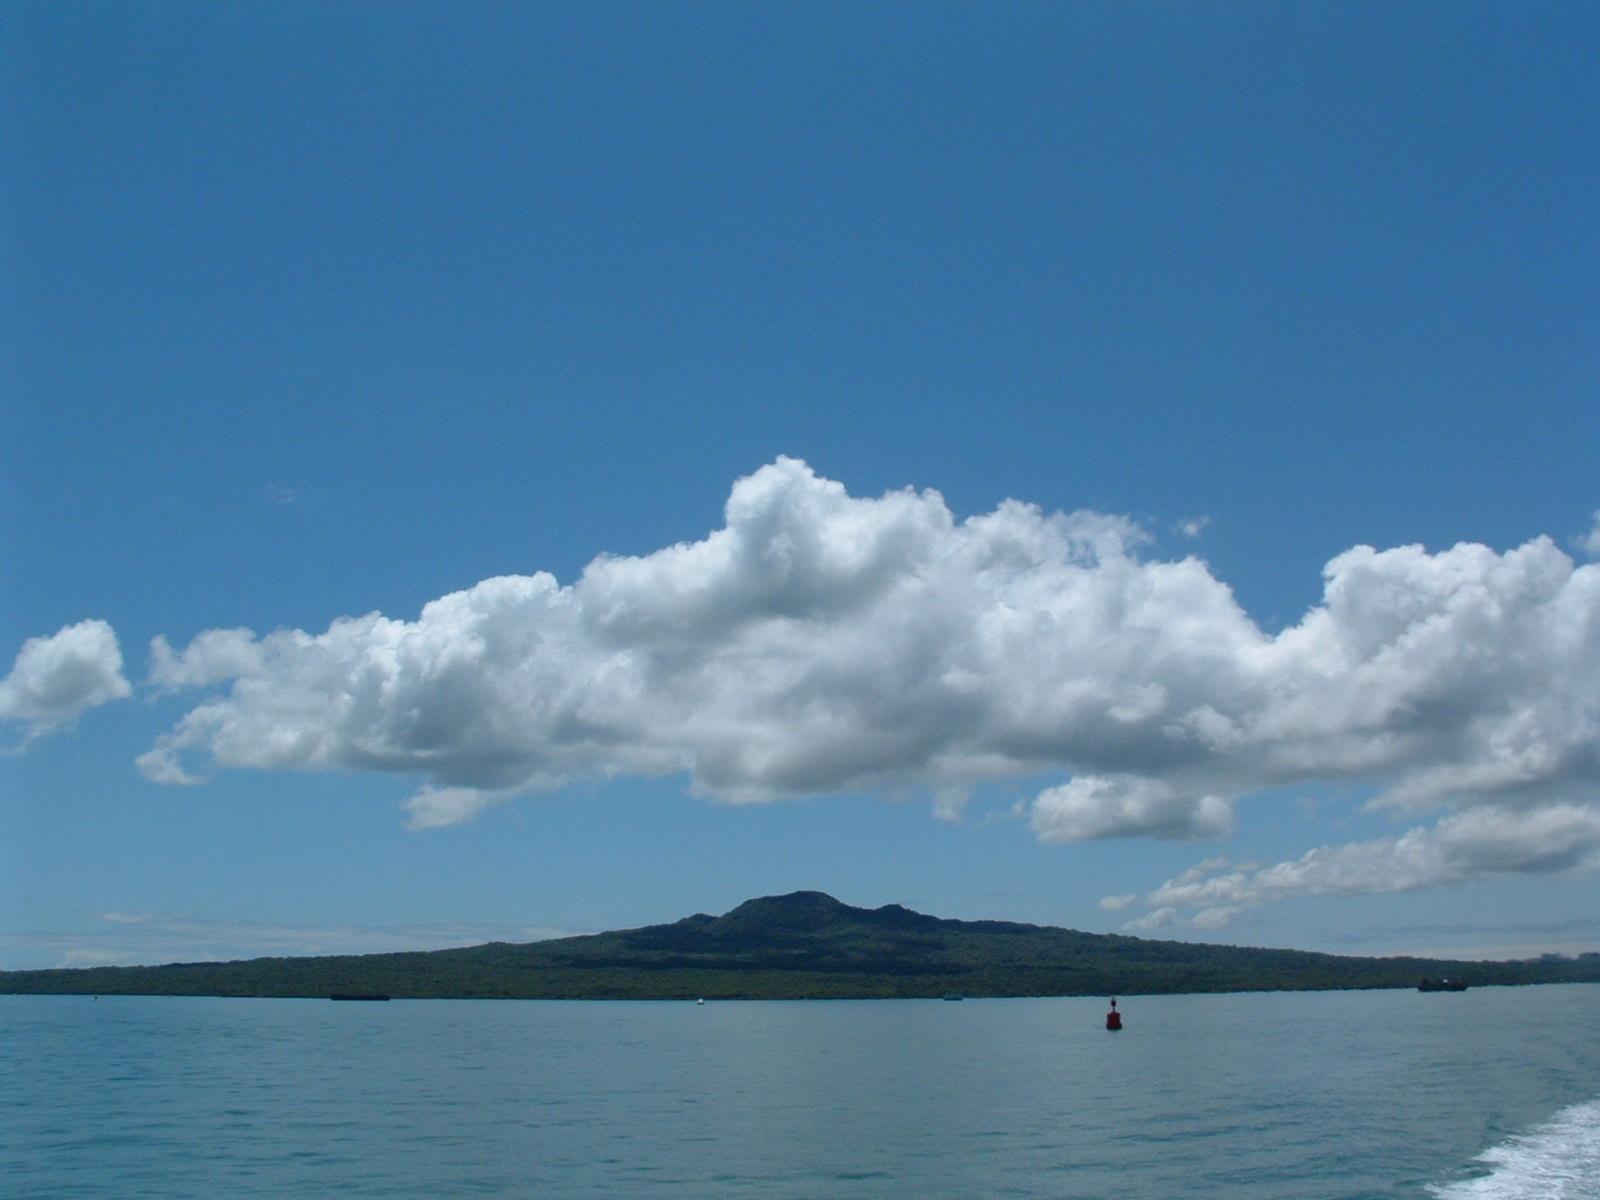 Rangitoto from Waitemata Harbor in Auckland